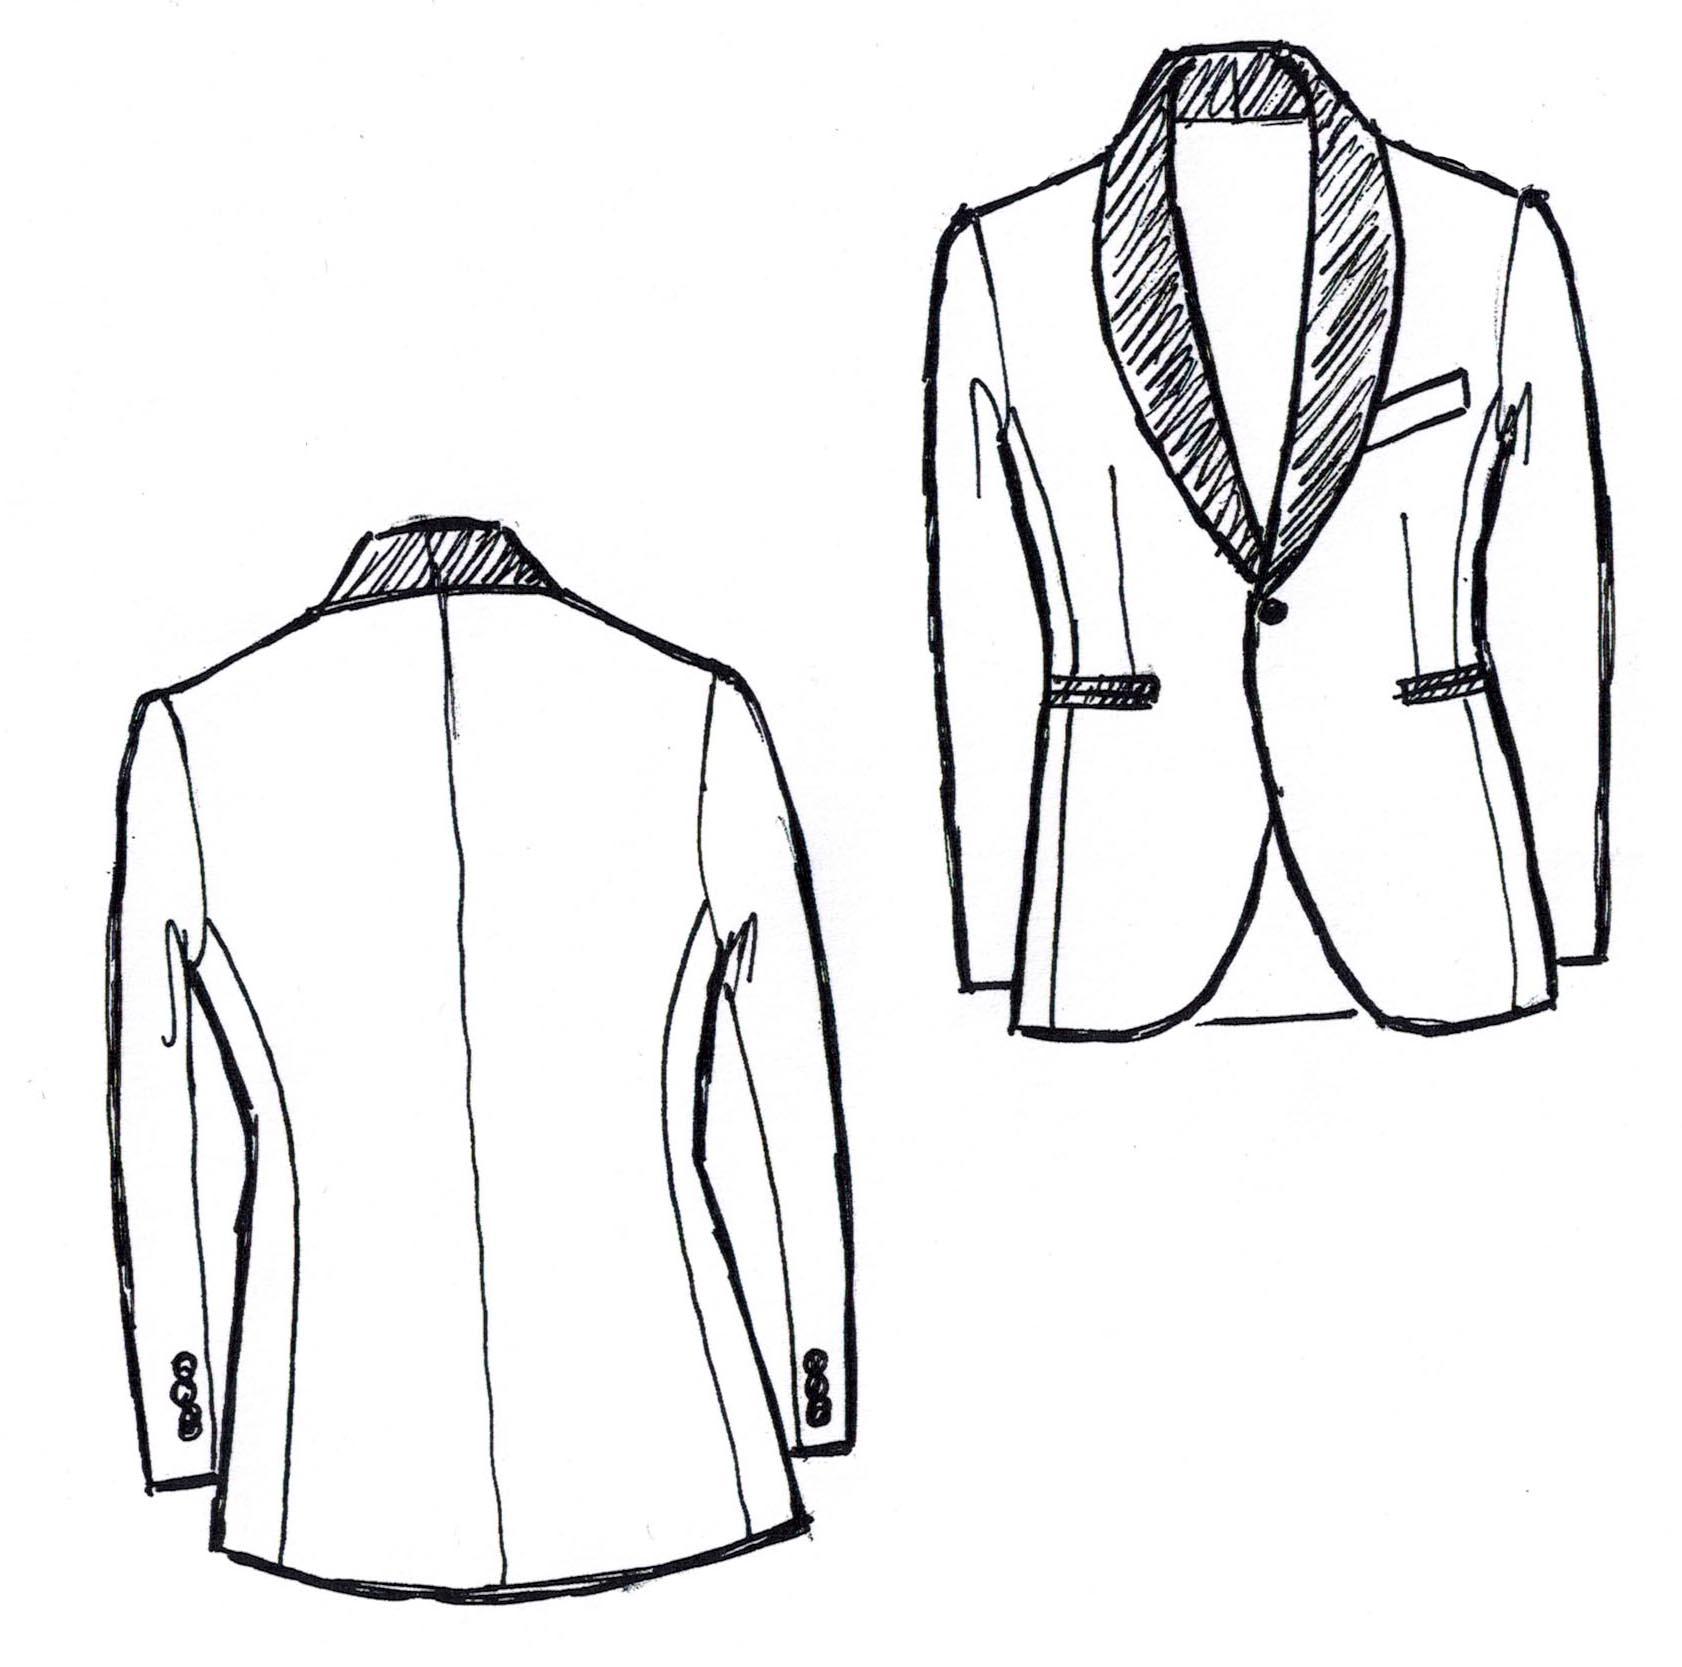 1682x1667 Tuxedo Drawing Tuxedo Jacket For Free Download